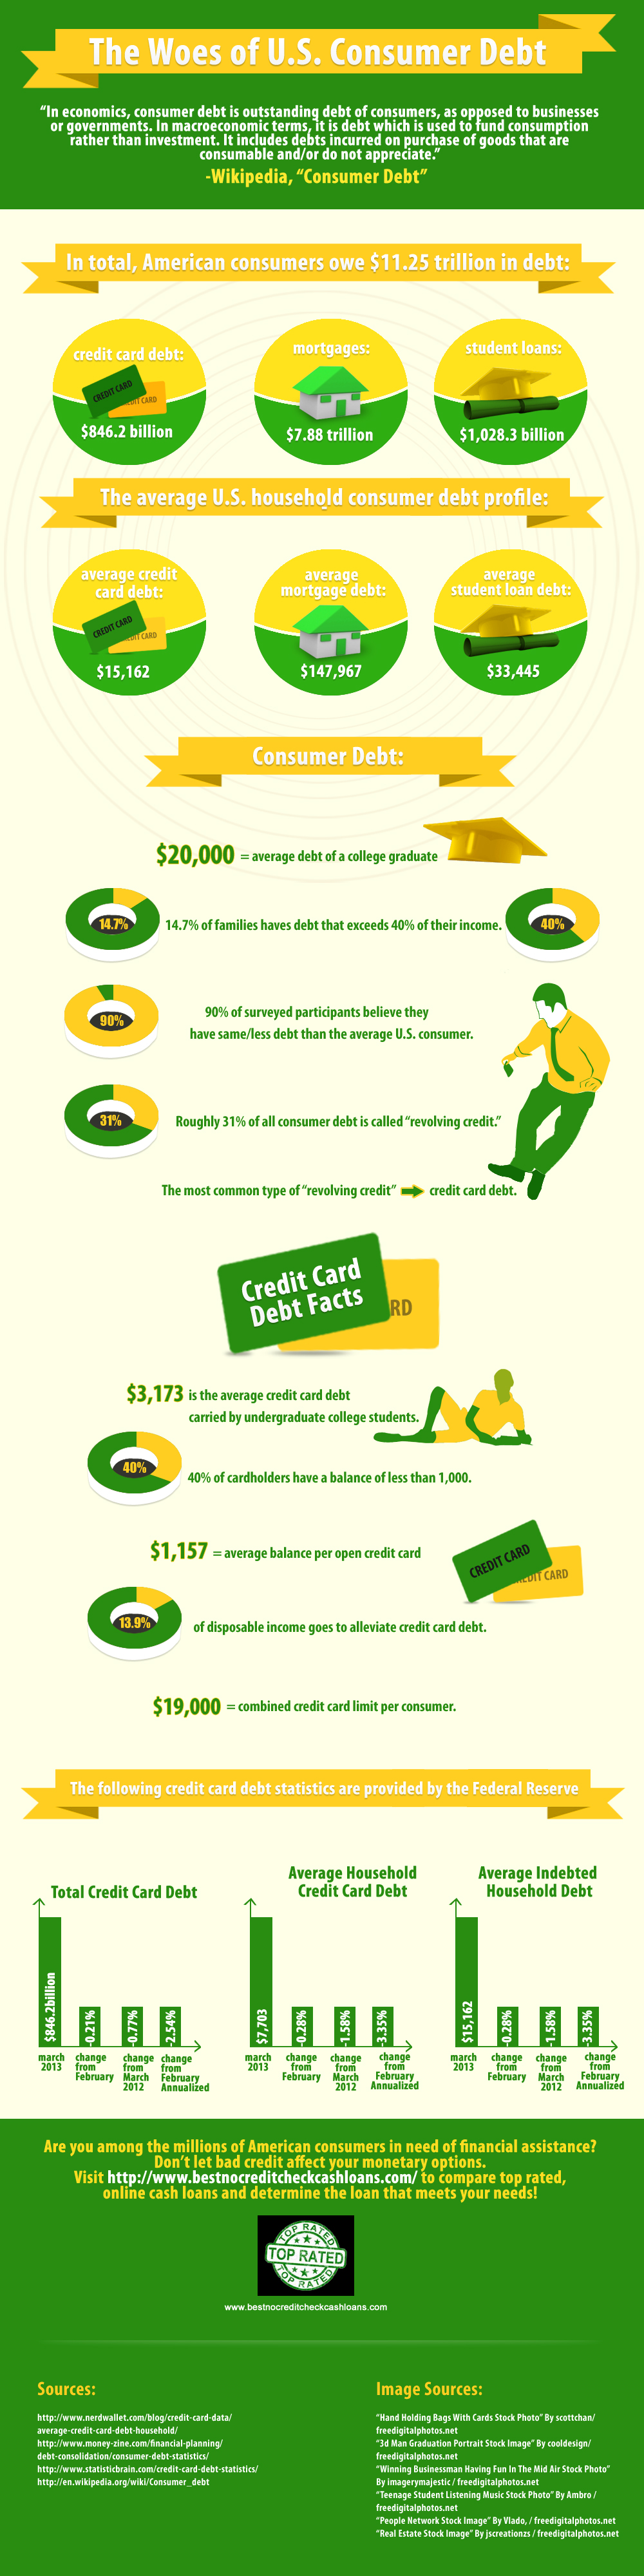 Debt Statistics For Us Consumers Consumer Debt Debt Need A Loan